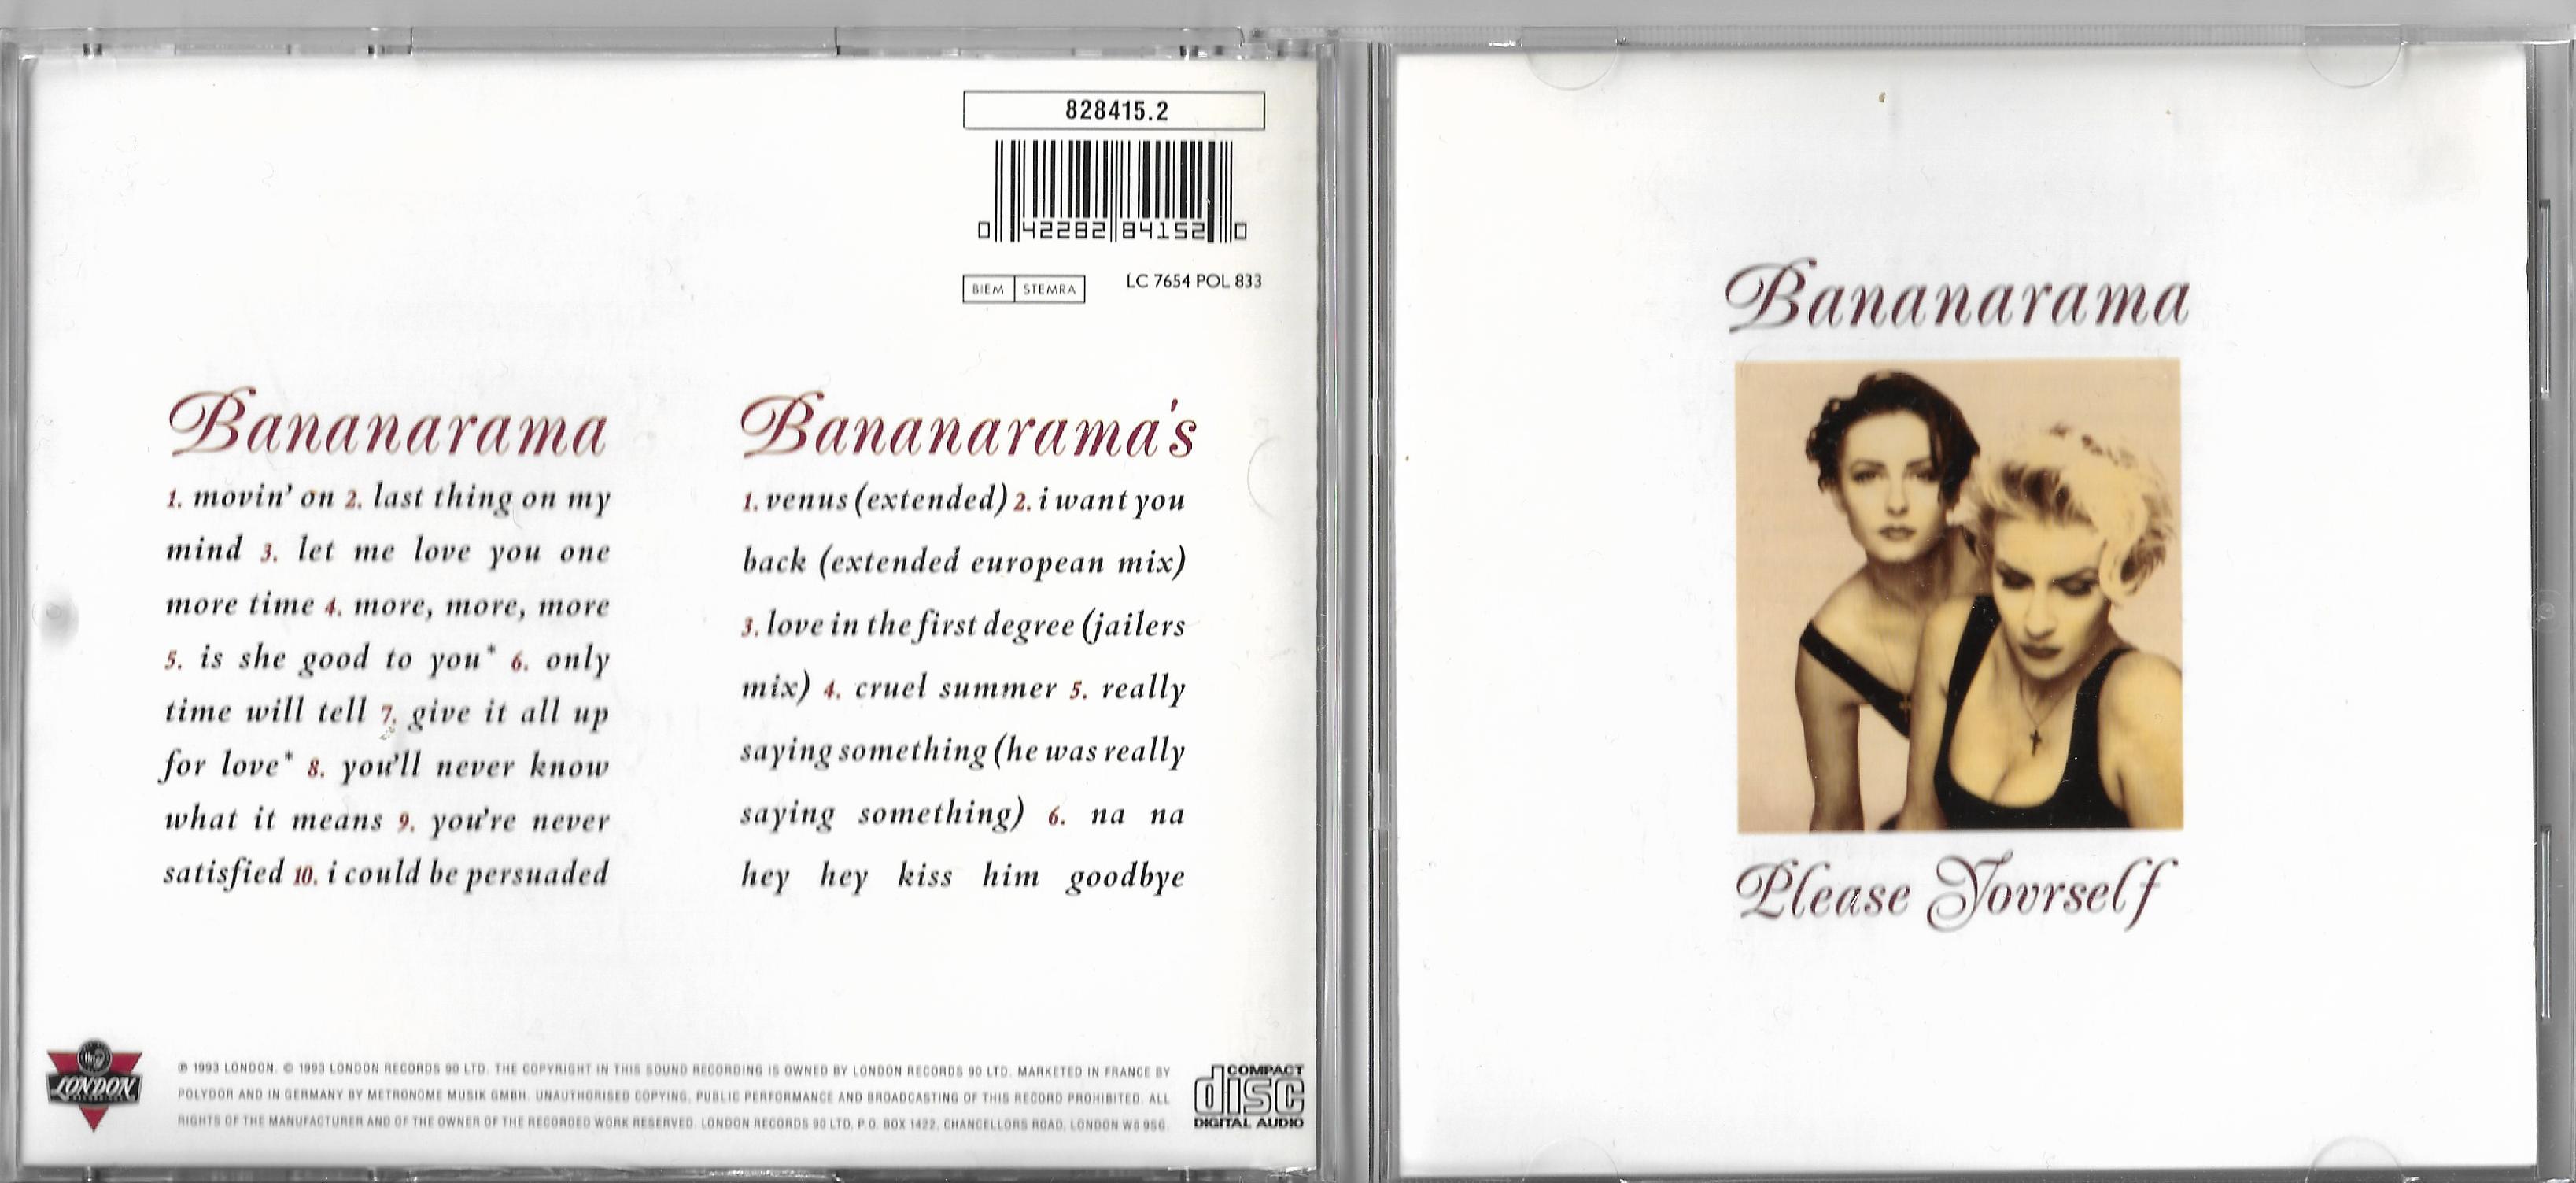 BANANARAMA - Please Yourself - CD x 2